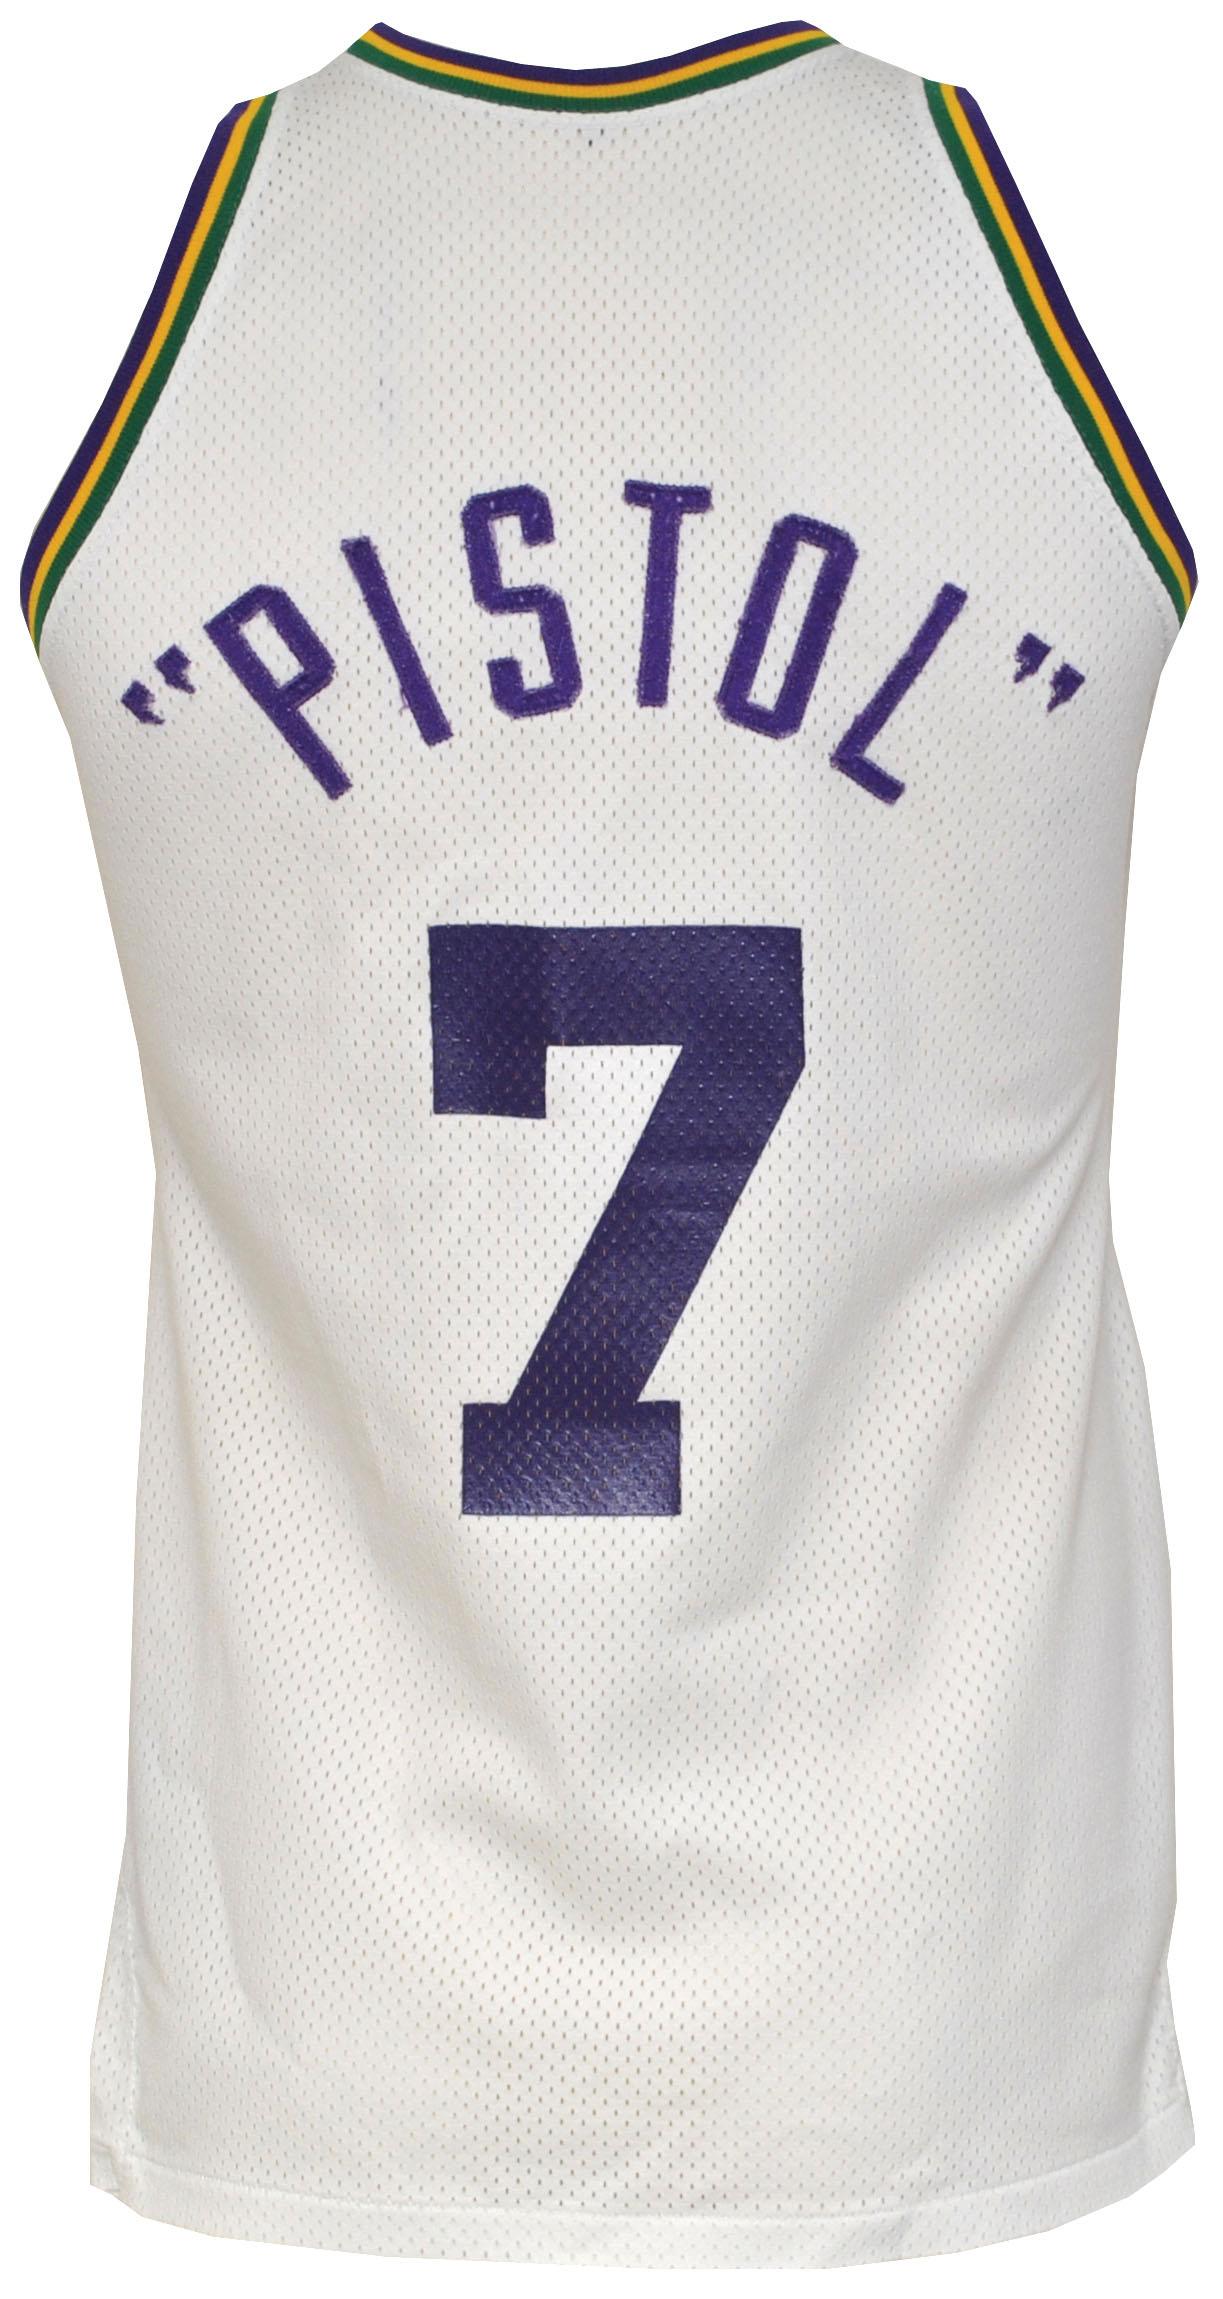 Pistol Pete Maravich game jersey Jazz